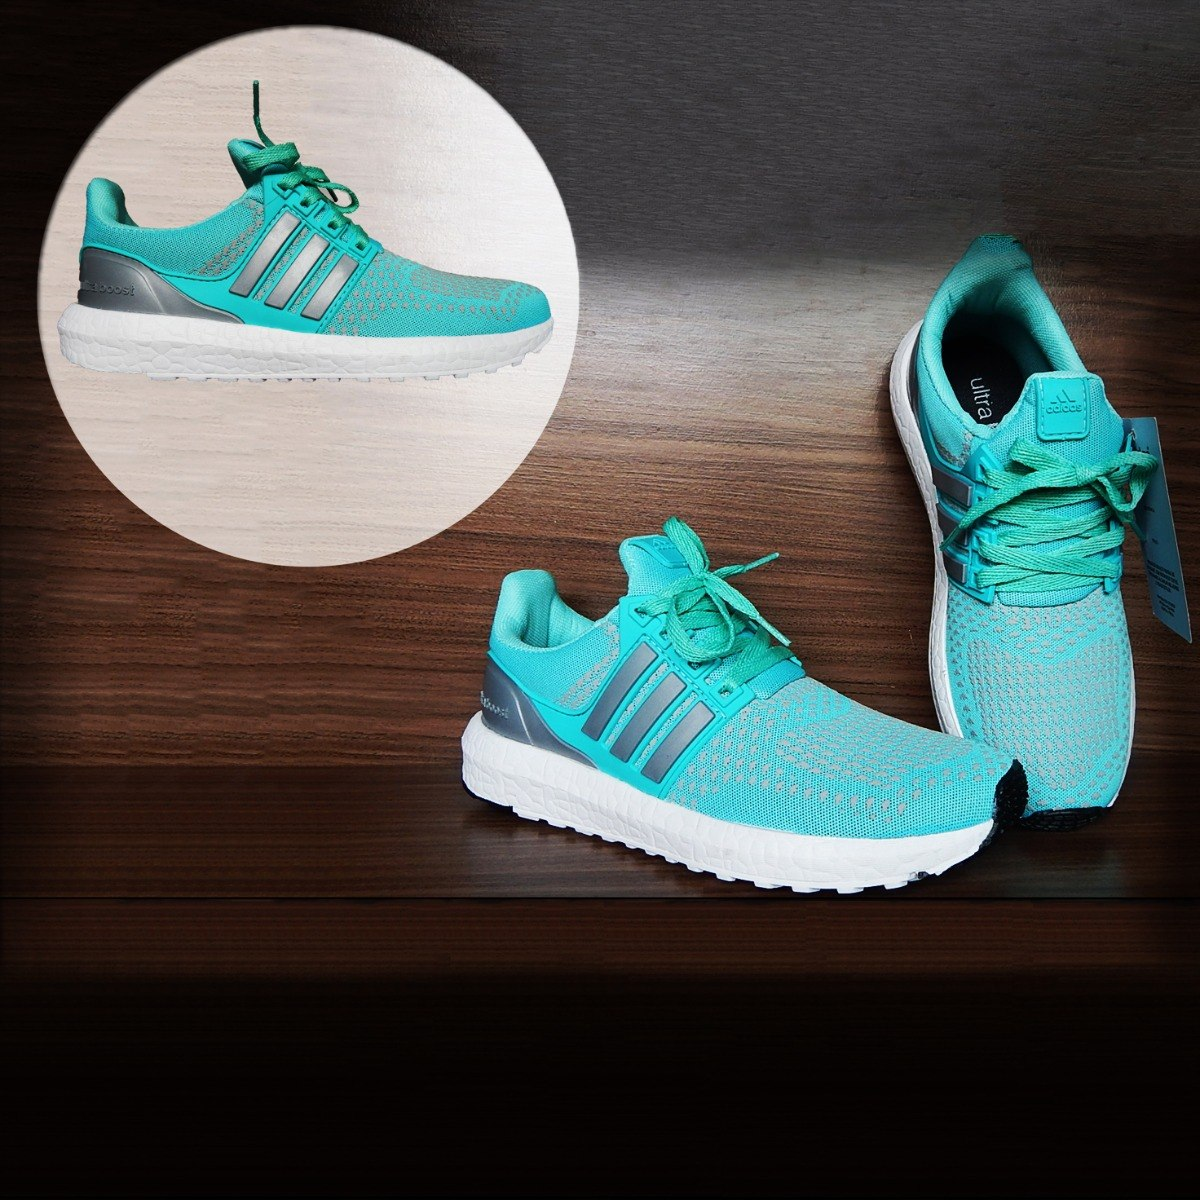 Tênis Feminino adidas Ultra Boost Endless Energy Verde Água - R  200 ... 4799f535902e0